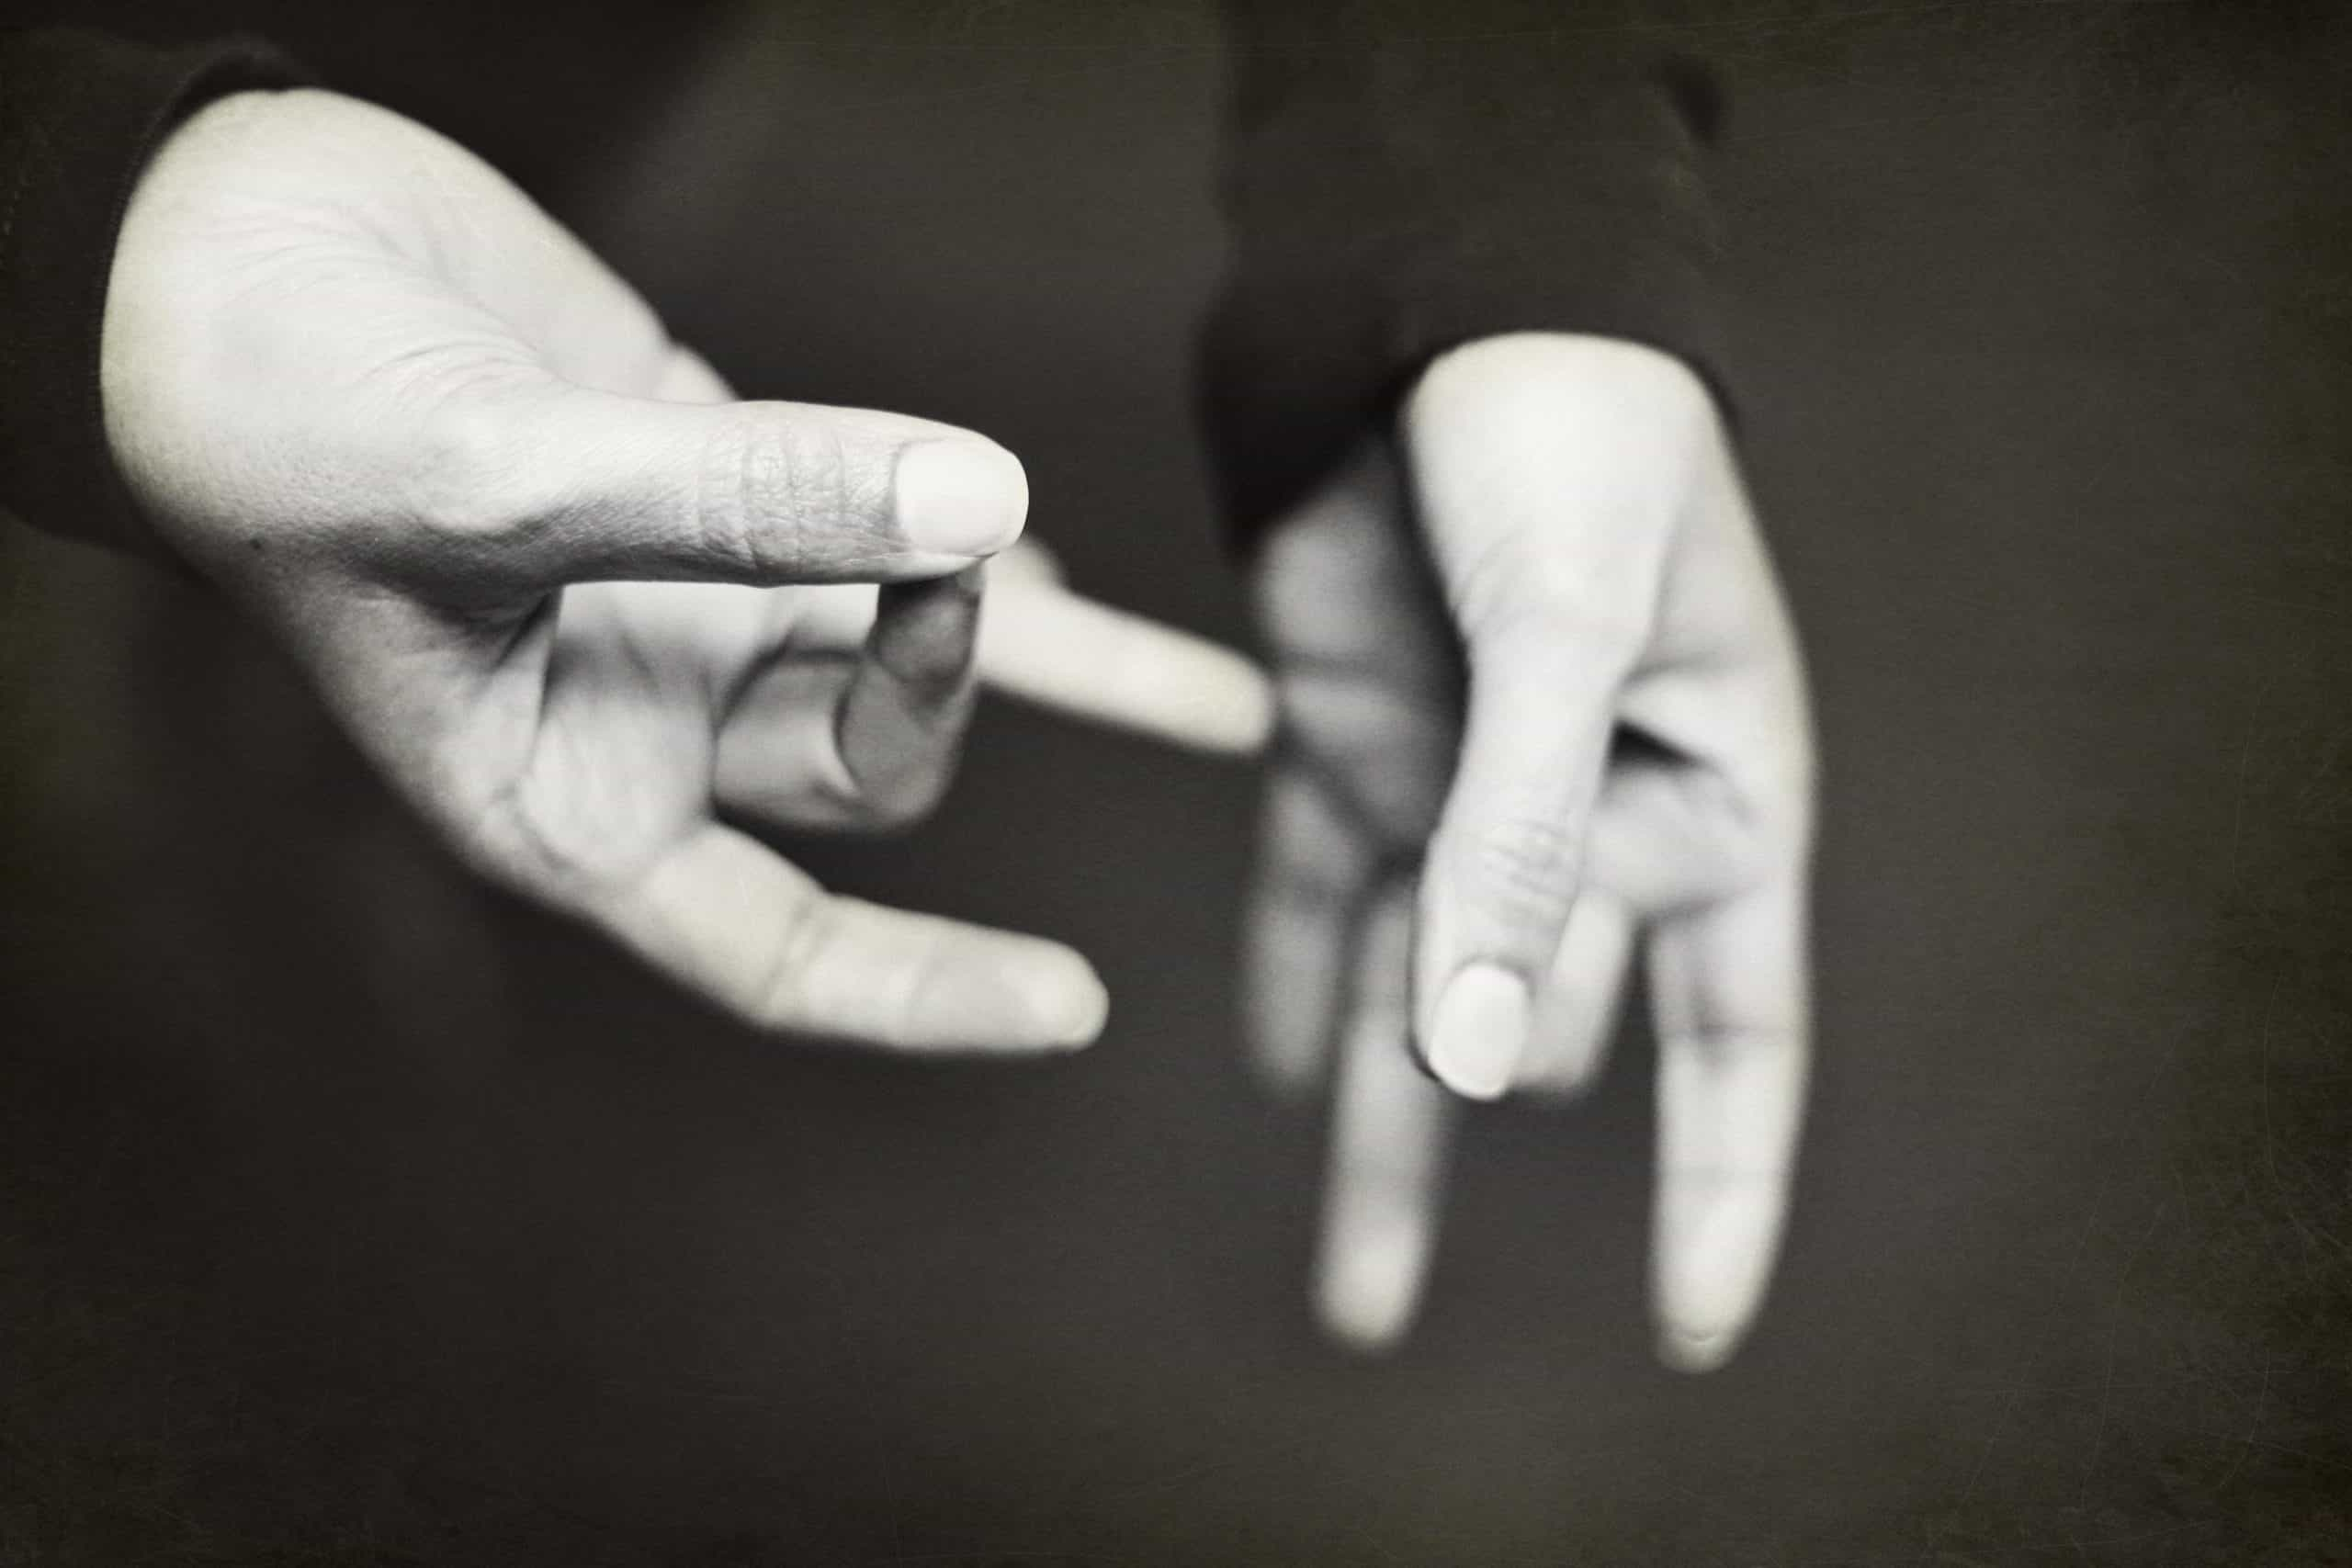 Best ASL course tutorial class certification training online